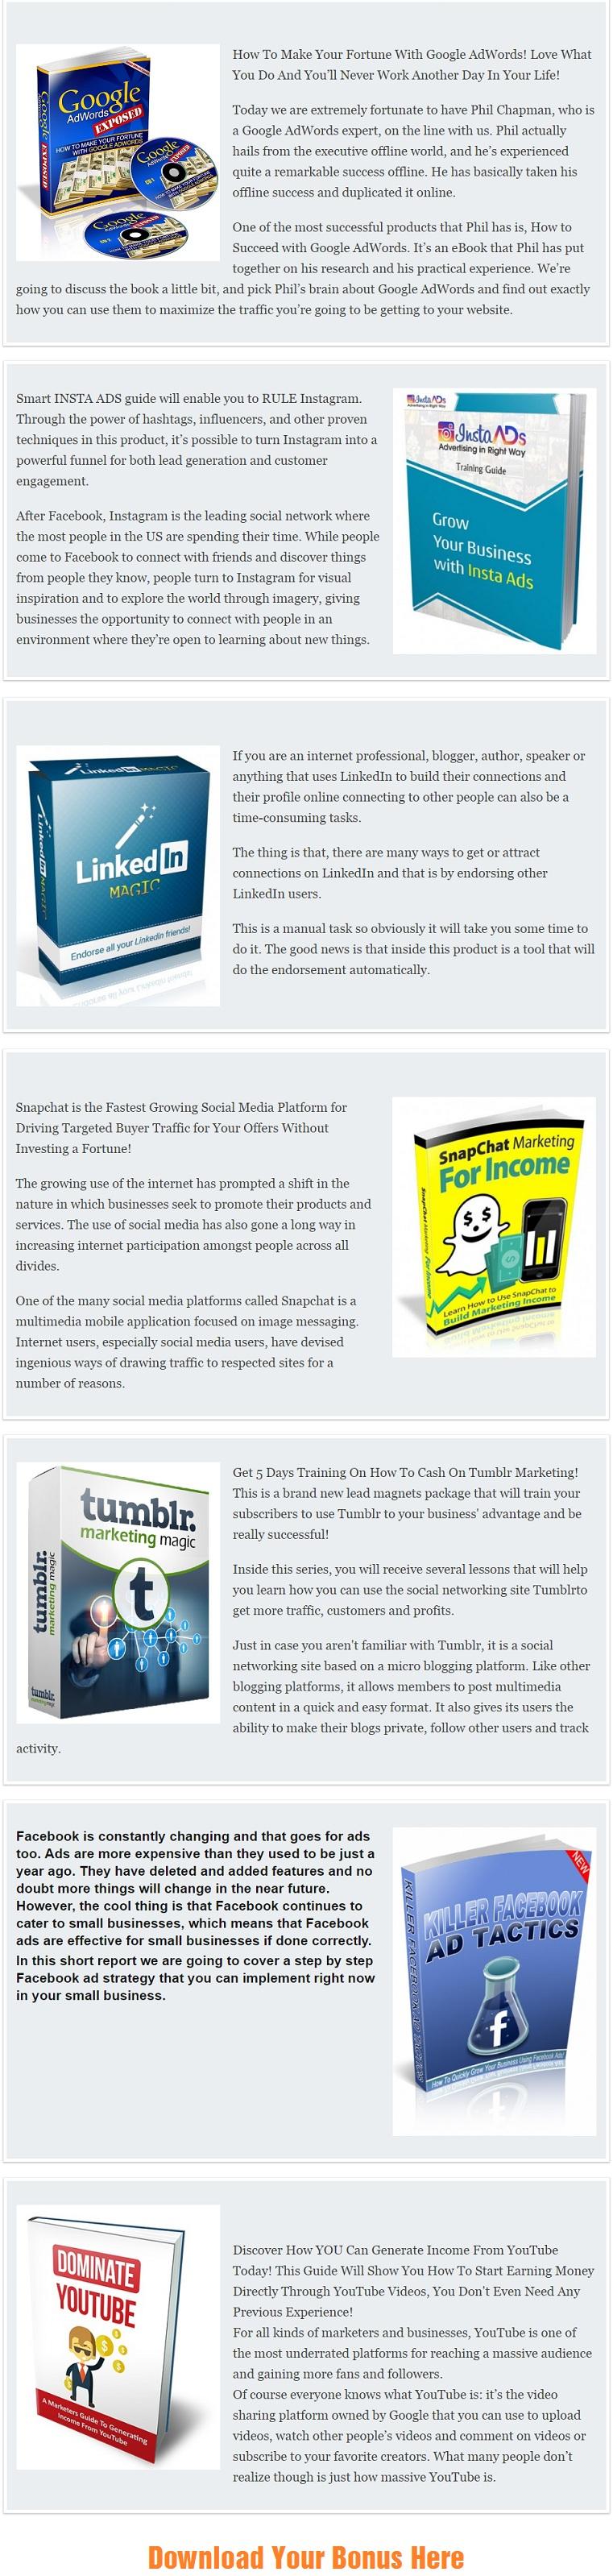 Online Ads Mantra PLR Bonus